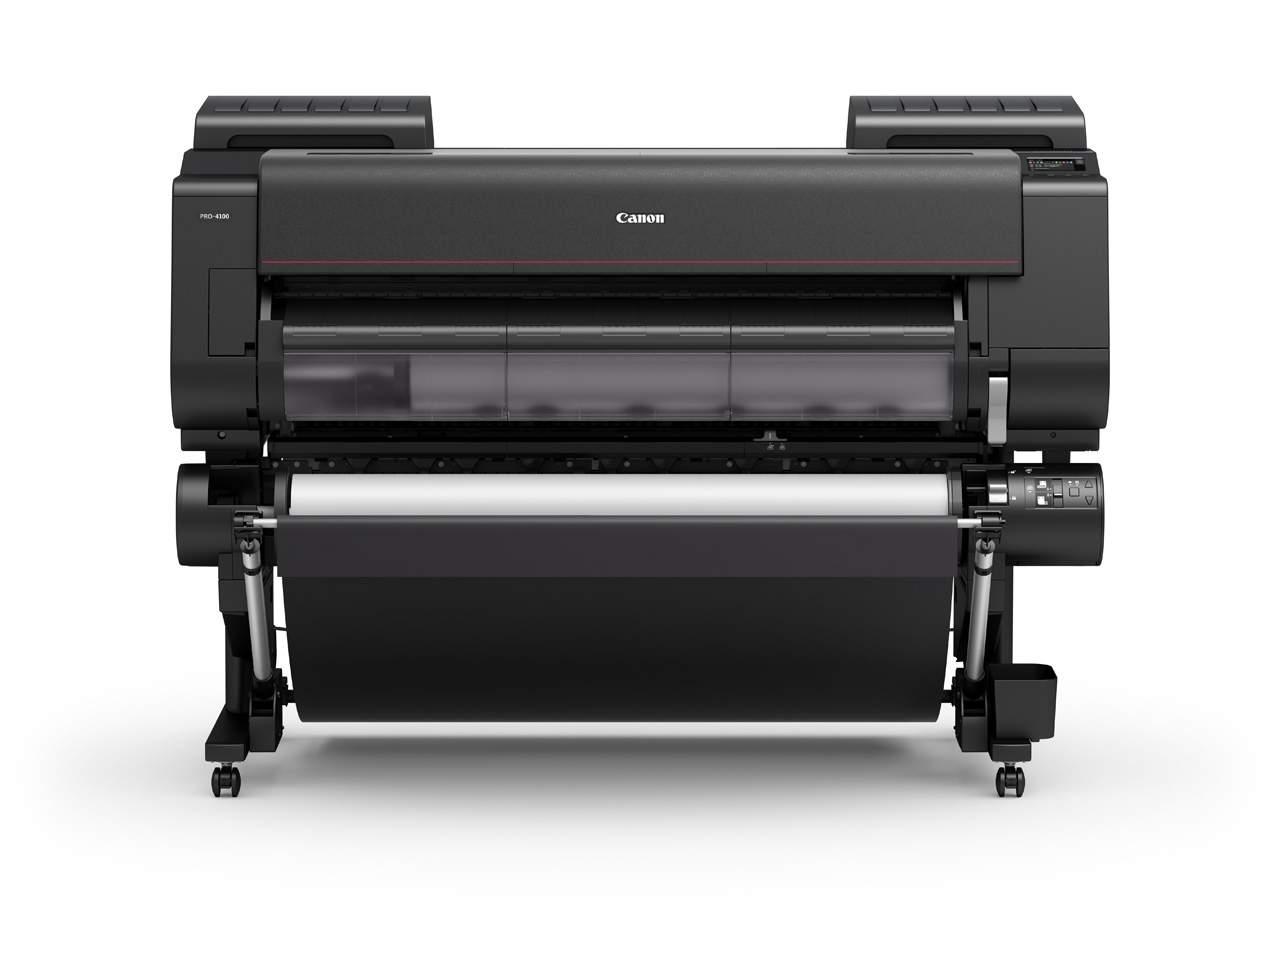 Wide format printer Canon Imageprograf 4100